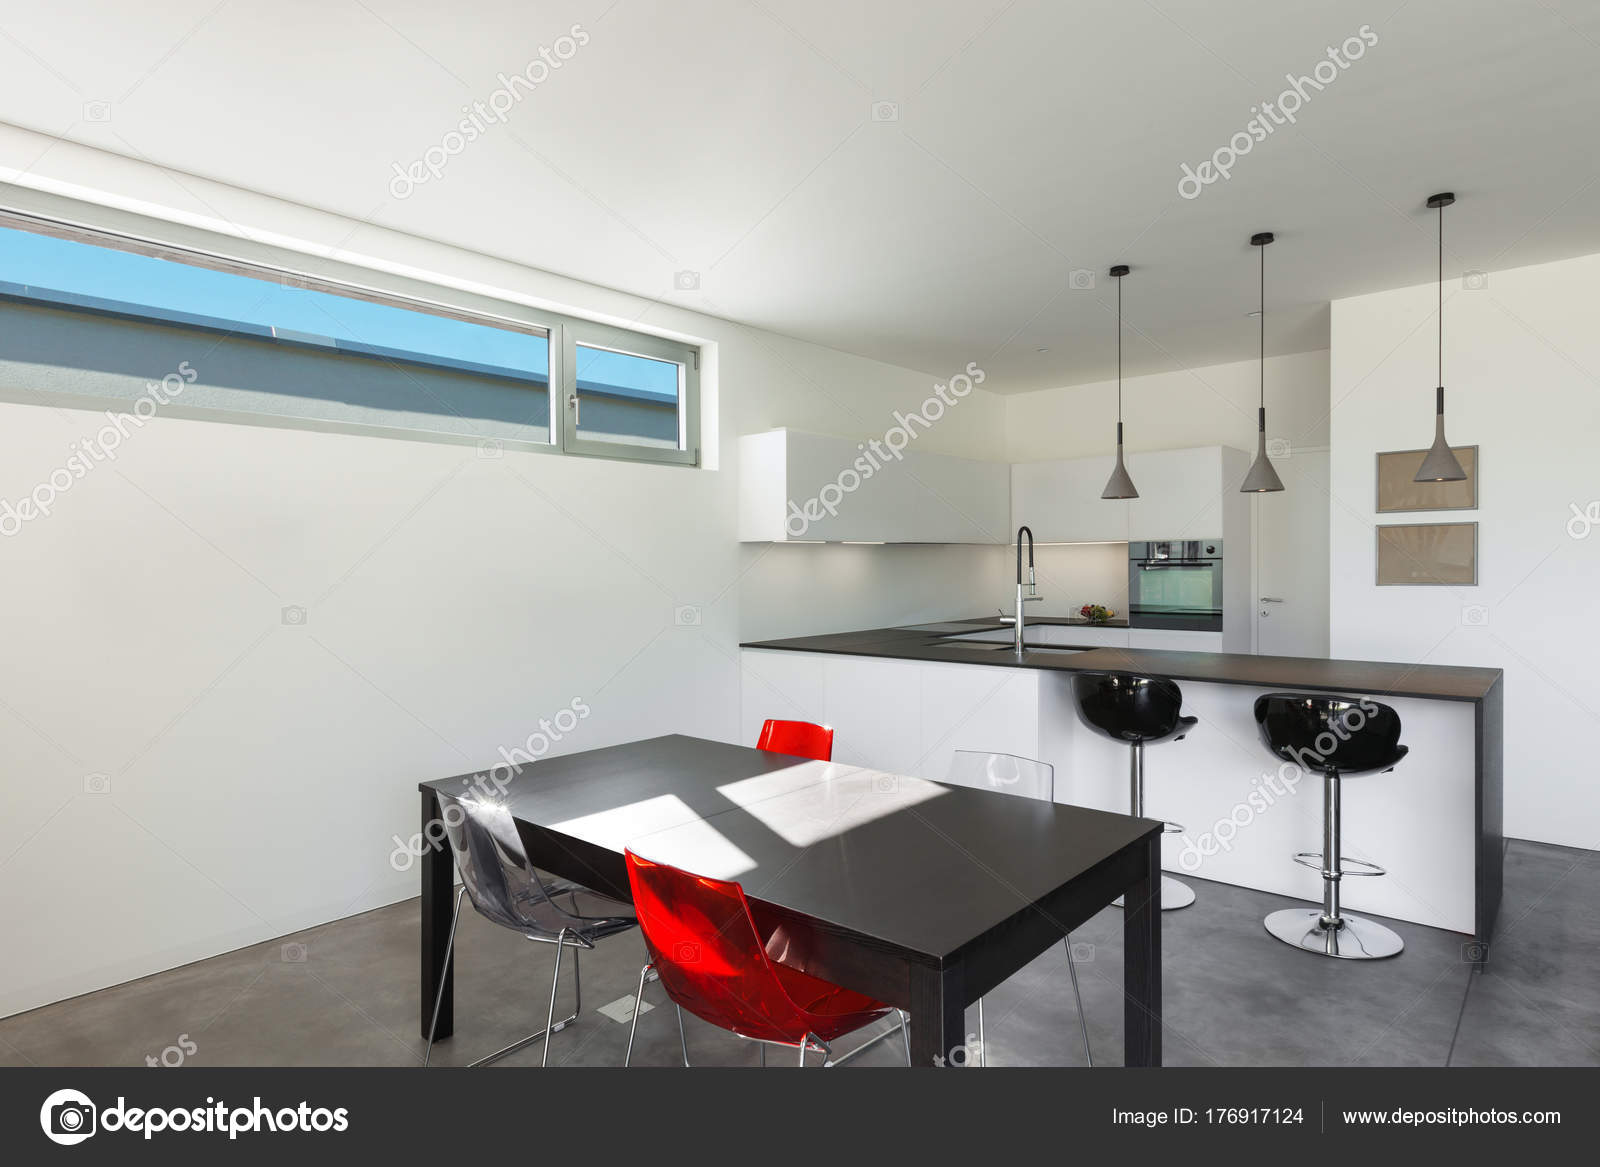 Moderne Keuken Inrichting : Interieur modern huis keuken u2014 stockfoto © zveiger #176917124